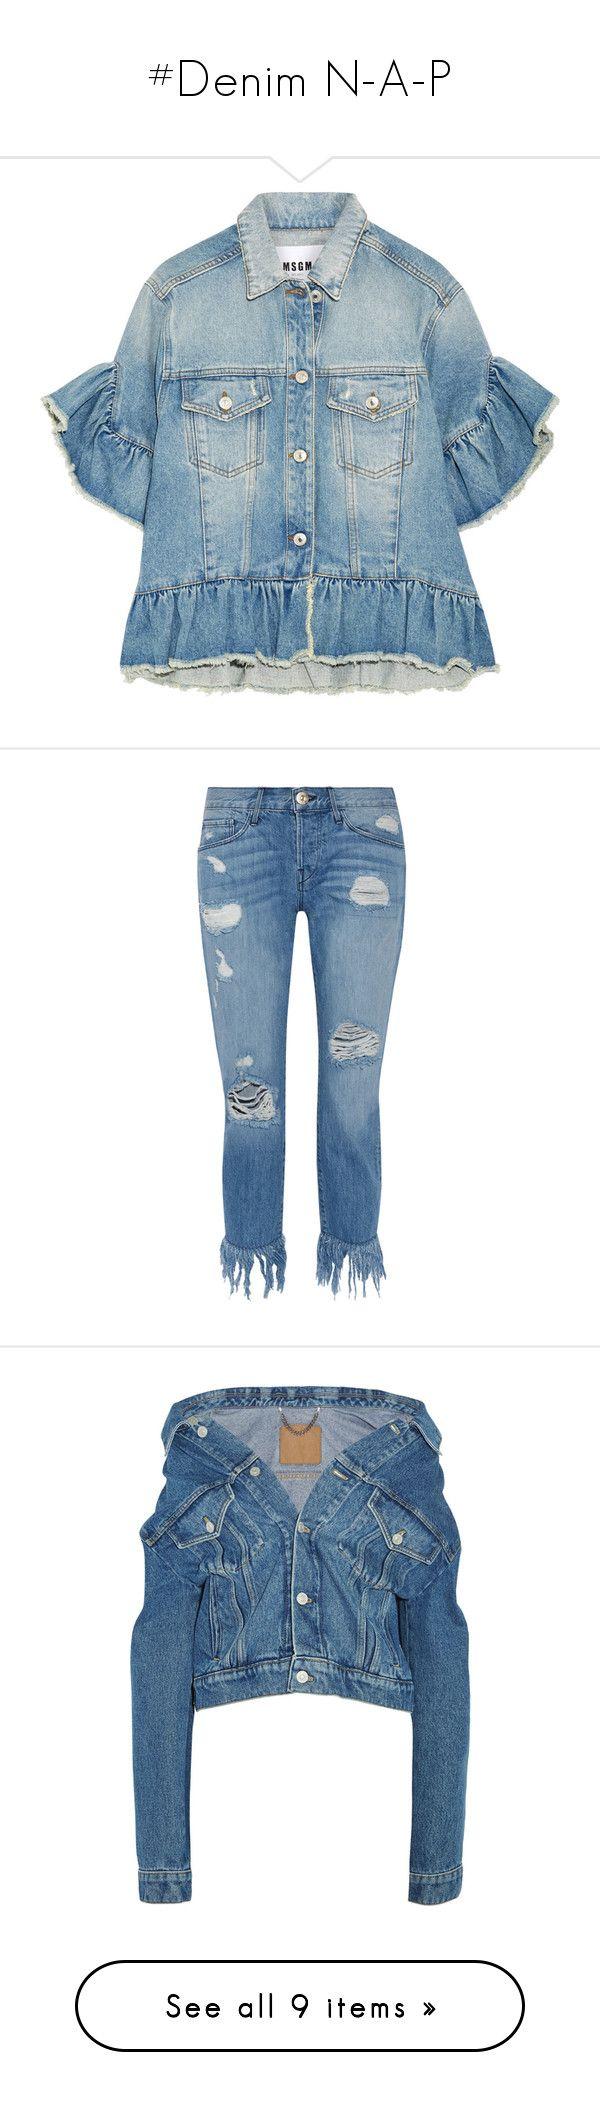 """#Denim N-A-P"" by lolgenie ❤ liked on Polyvore featuring outerwear, jackets, light blue, denim jacket, short sleeve jean jacket, distressed jean jacket, blue jean jacket, distressed denim jacket, jeans and pants"